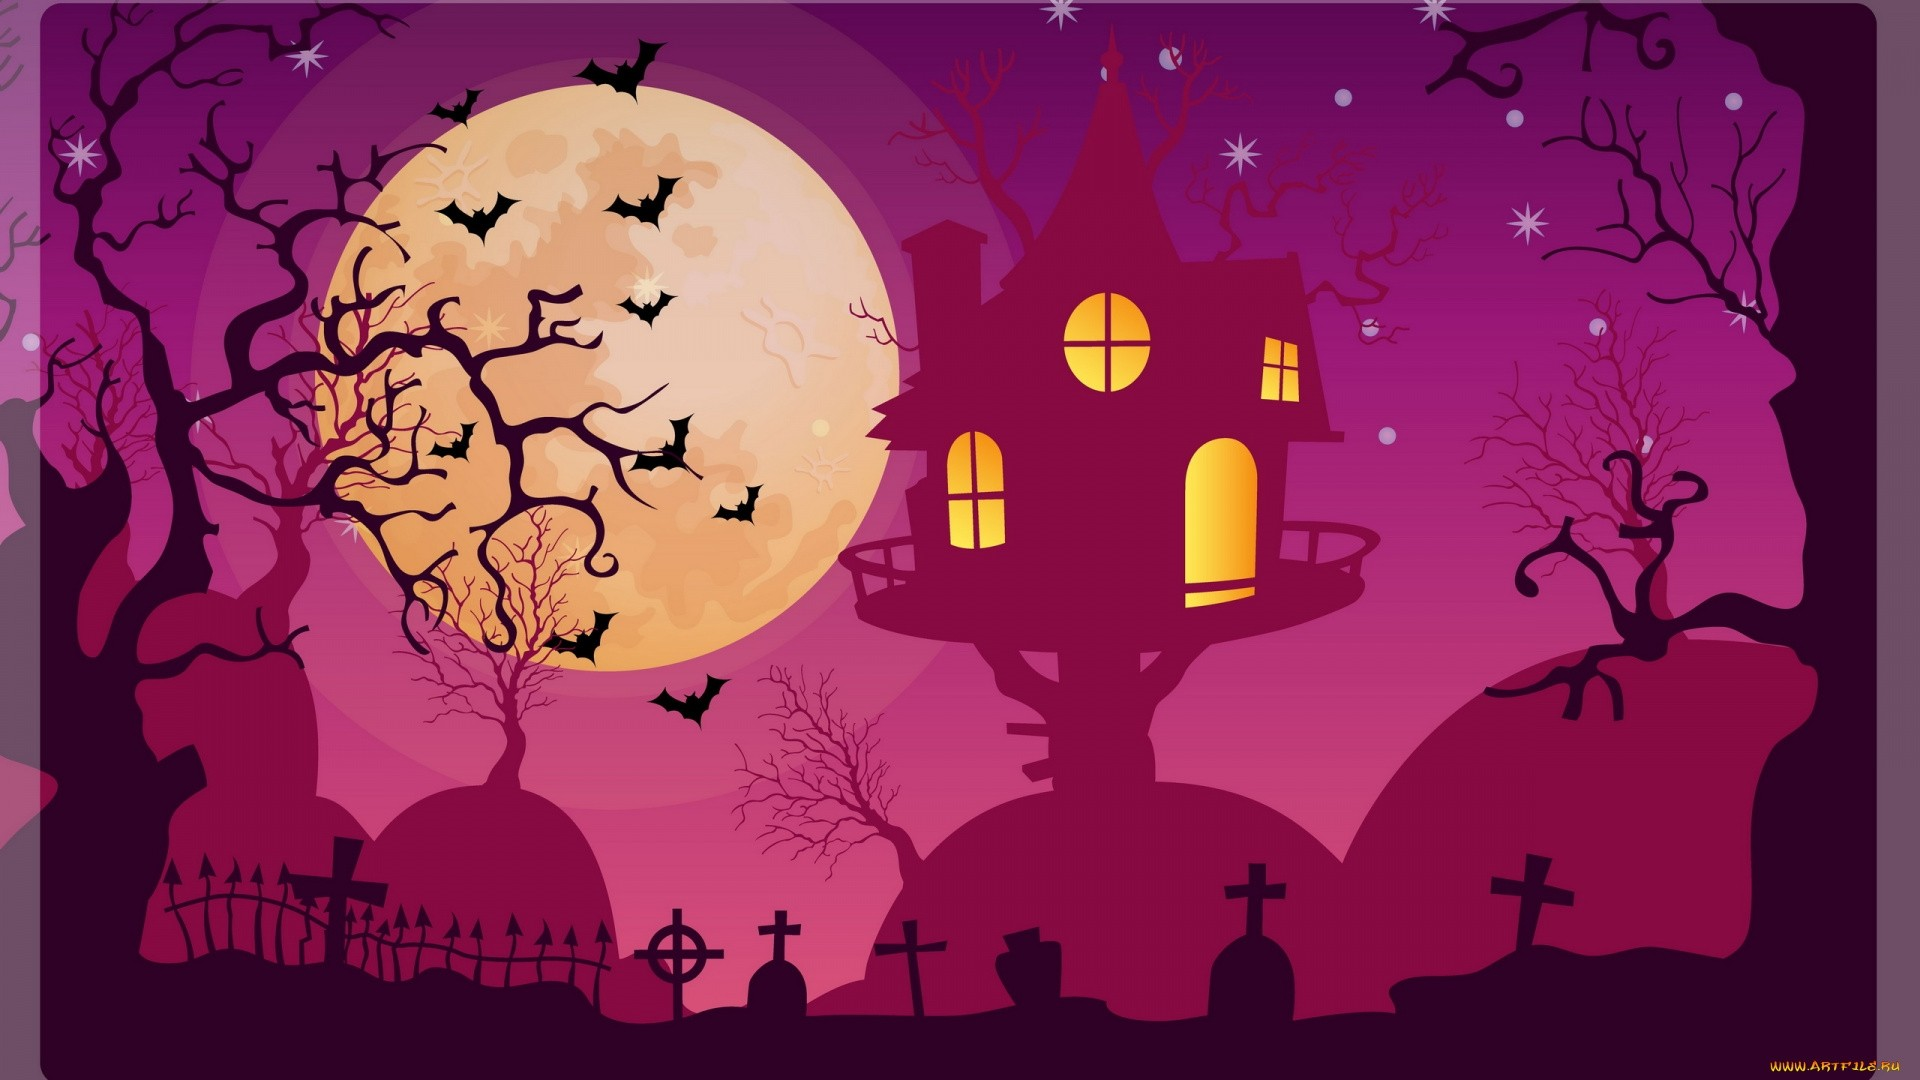 Spooky Vector hd wallpaper download